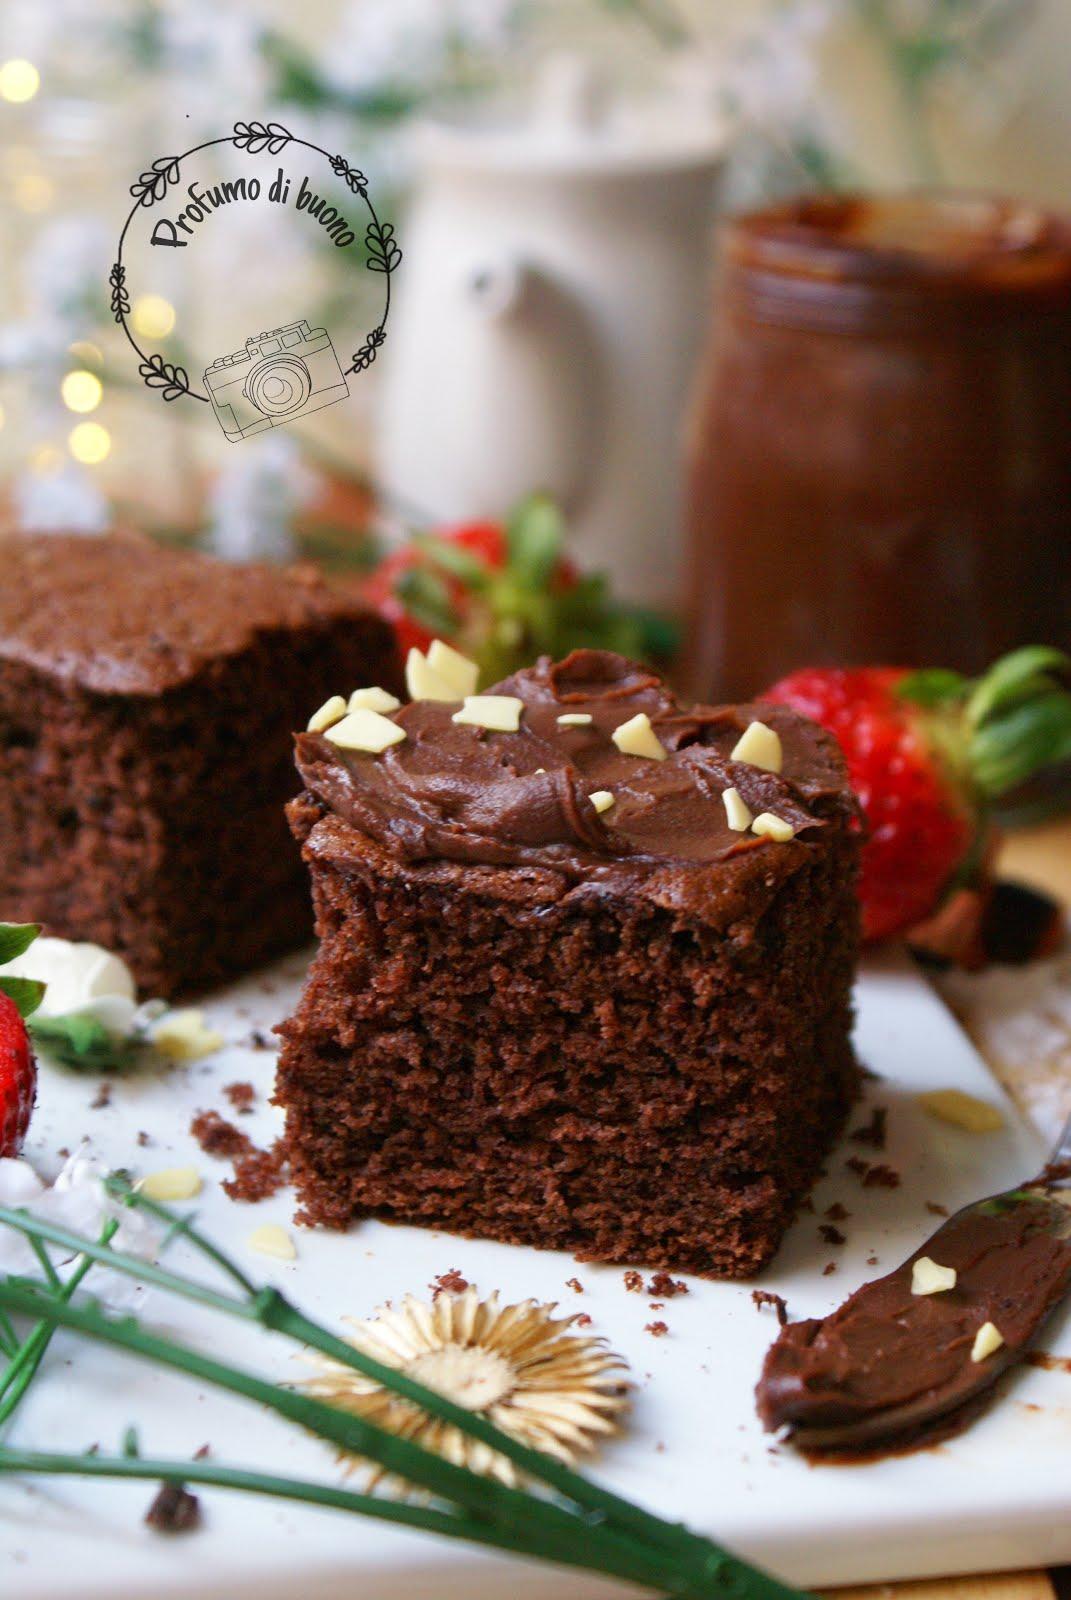 Quadrotti panna e cacao senza glutine